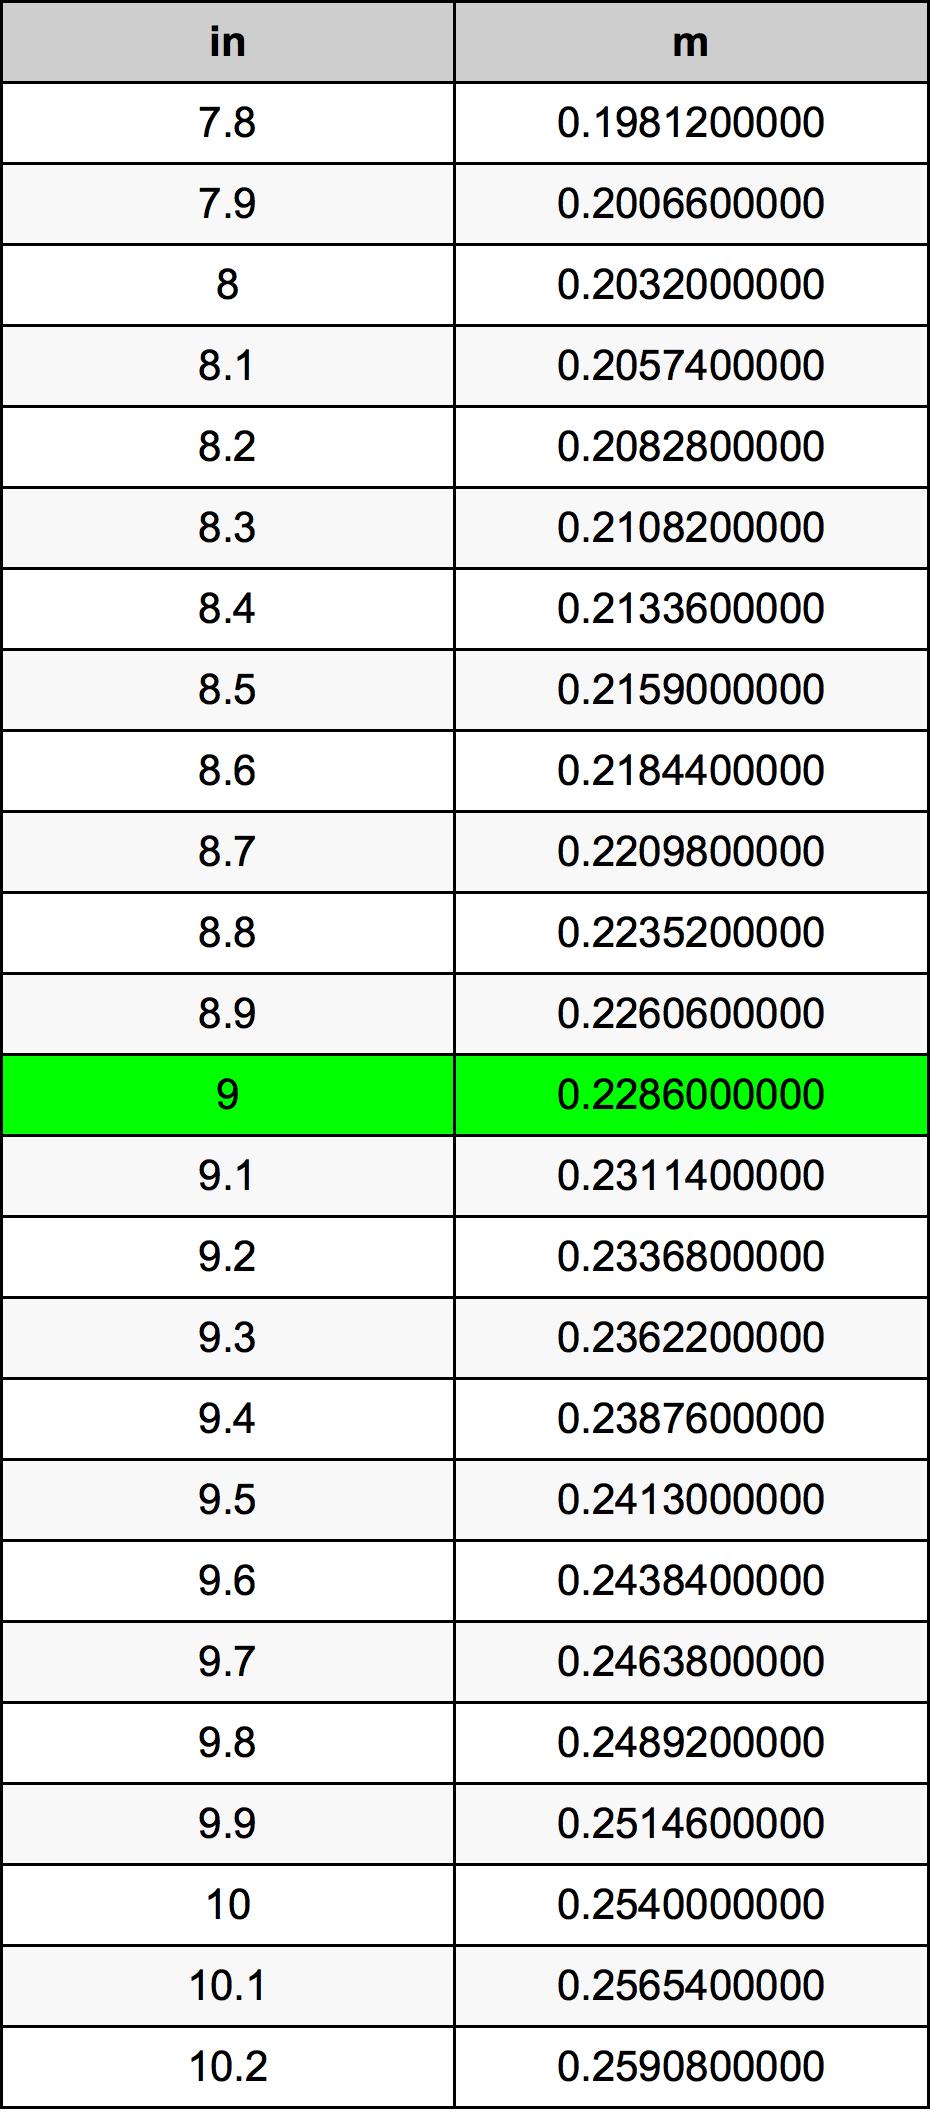 9 дюйм Таблица преобразования